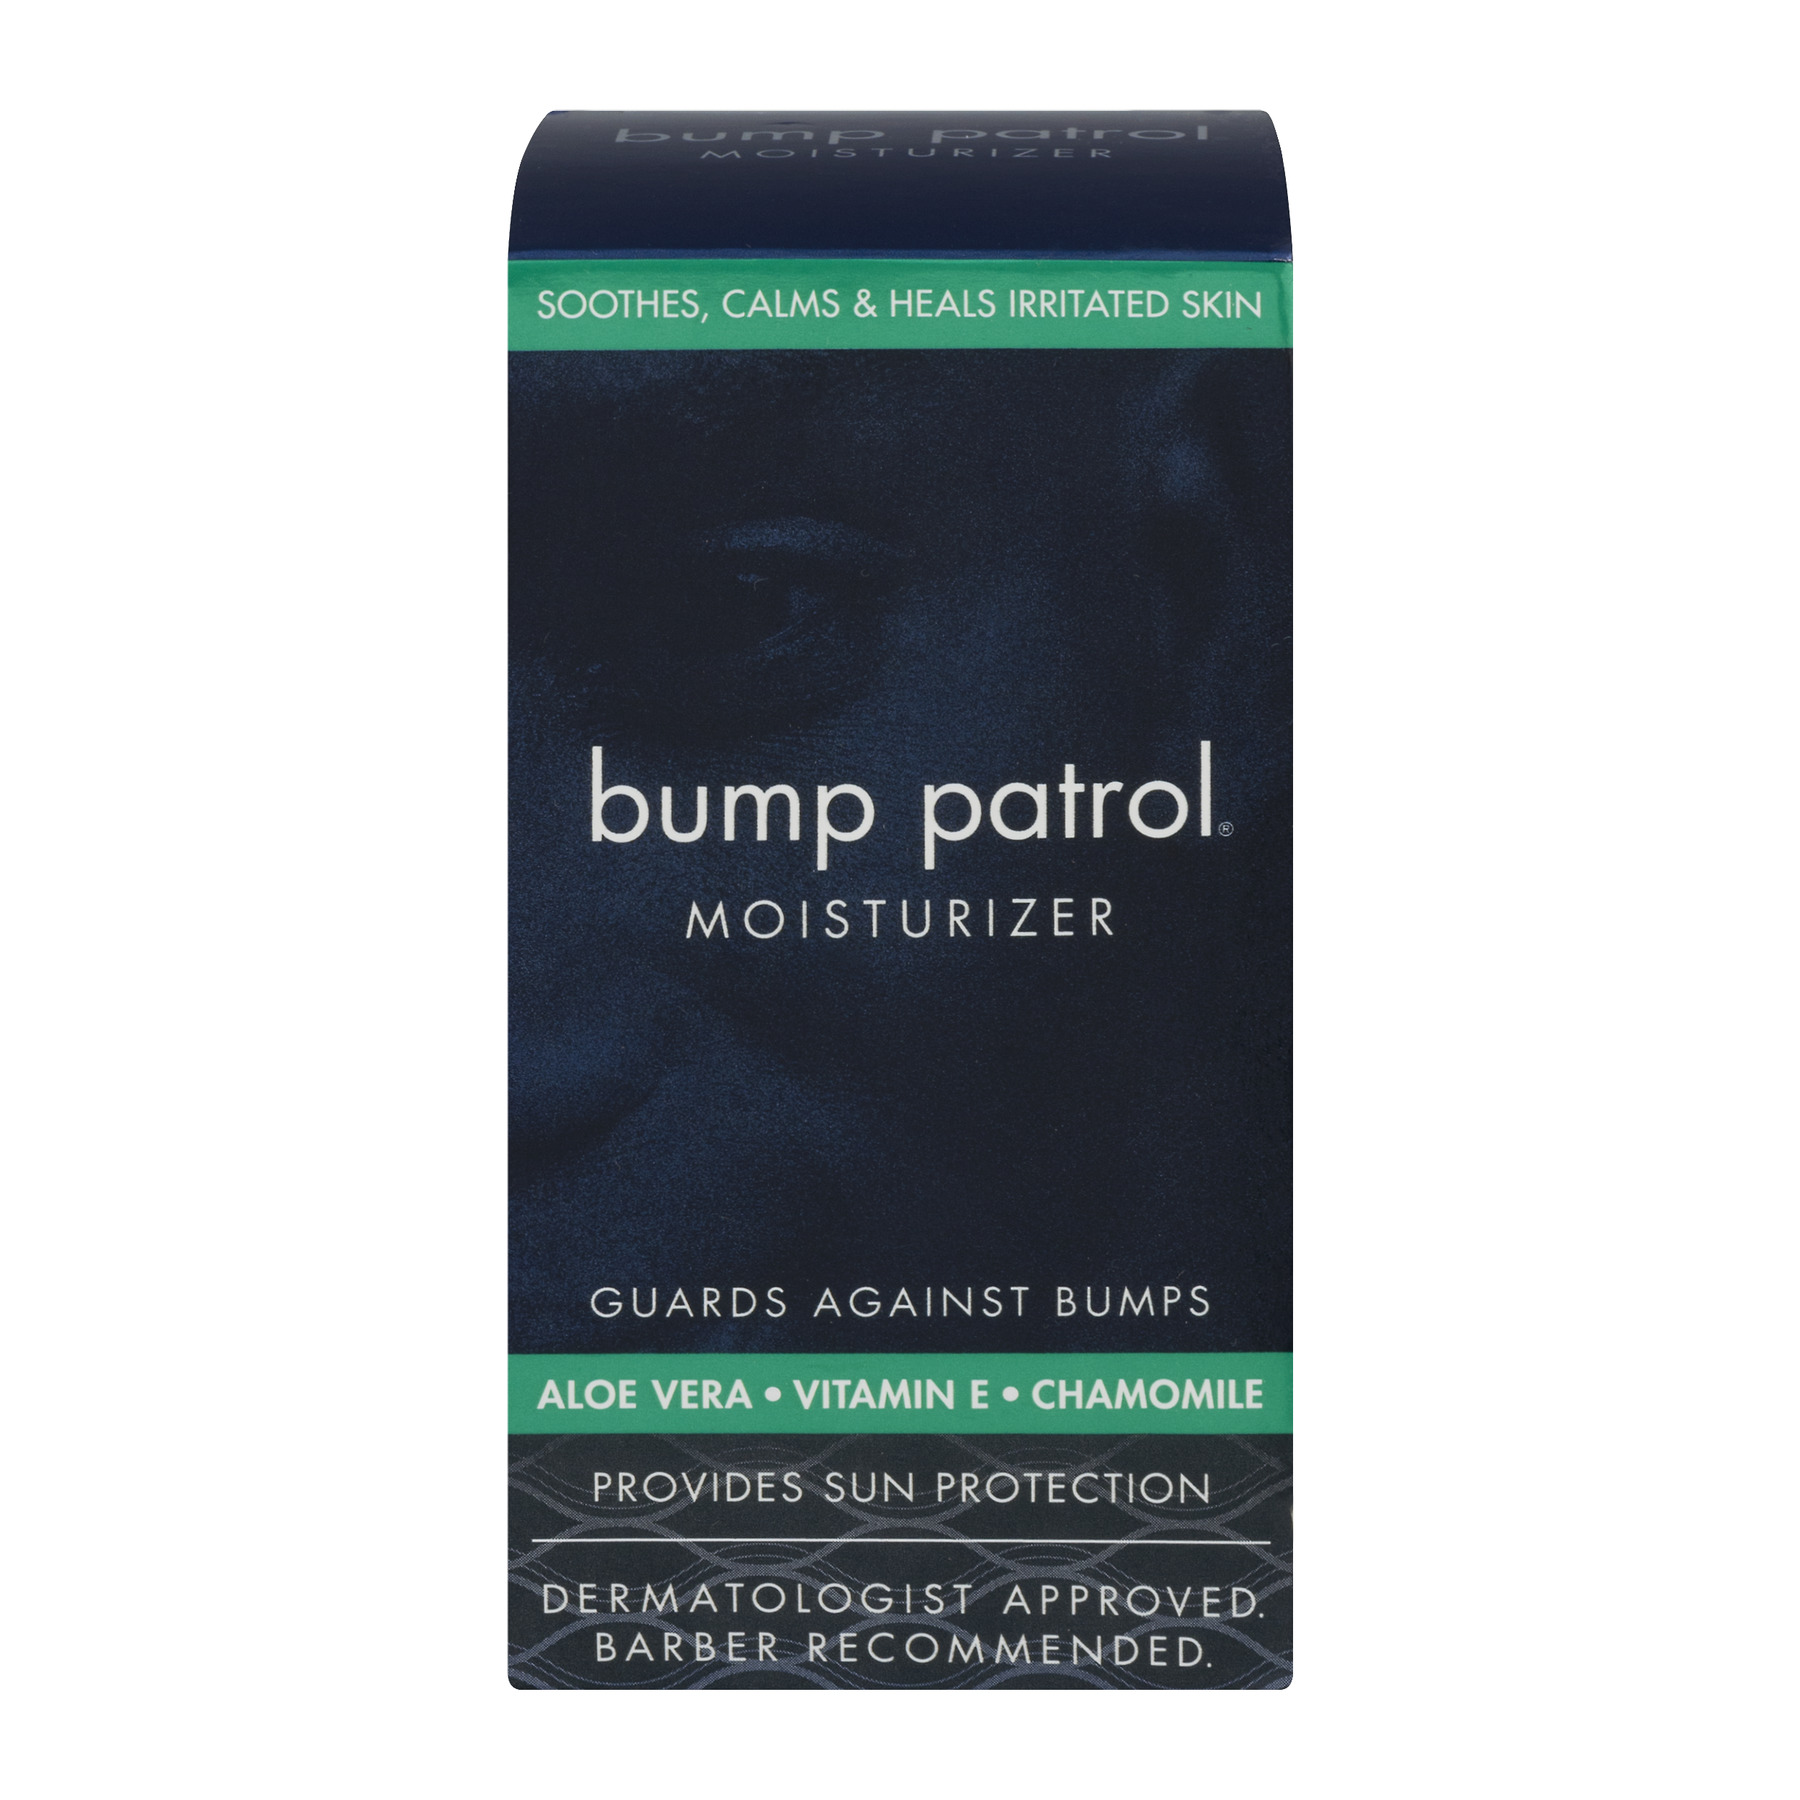 Bump Patrol Moisturizer Aloe Vera -Vitamin E-Chamomile, 1.69 FL OZ